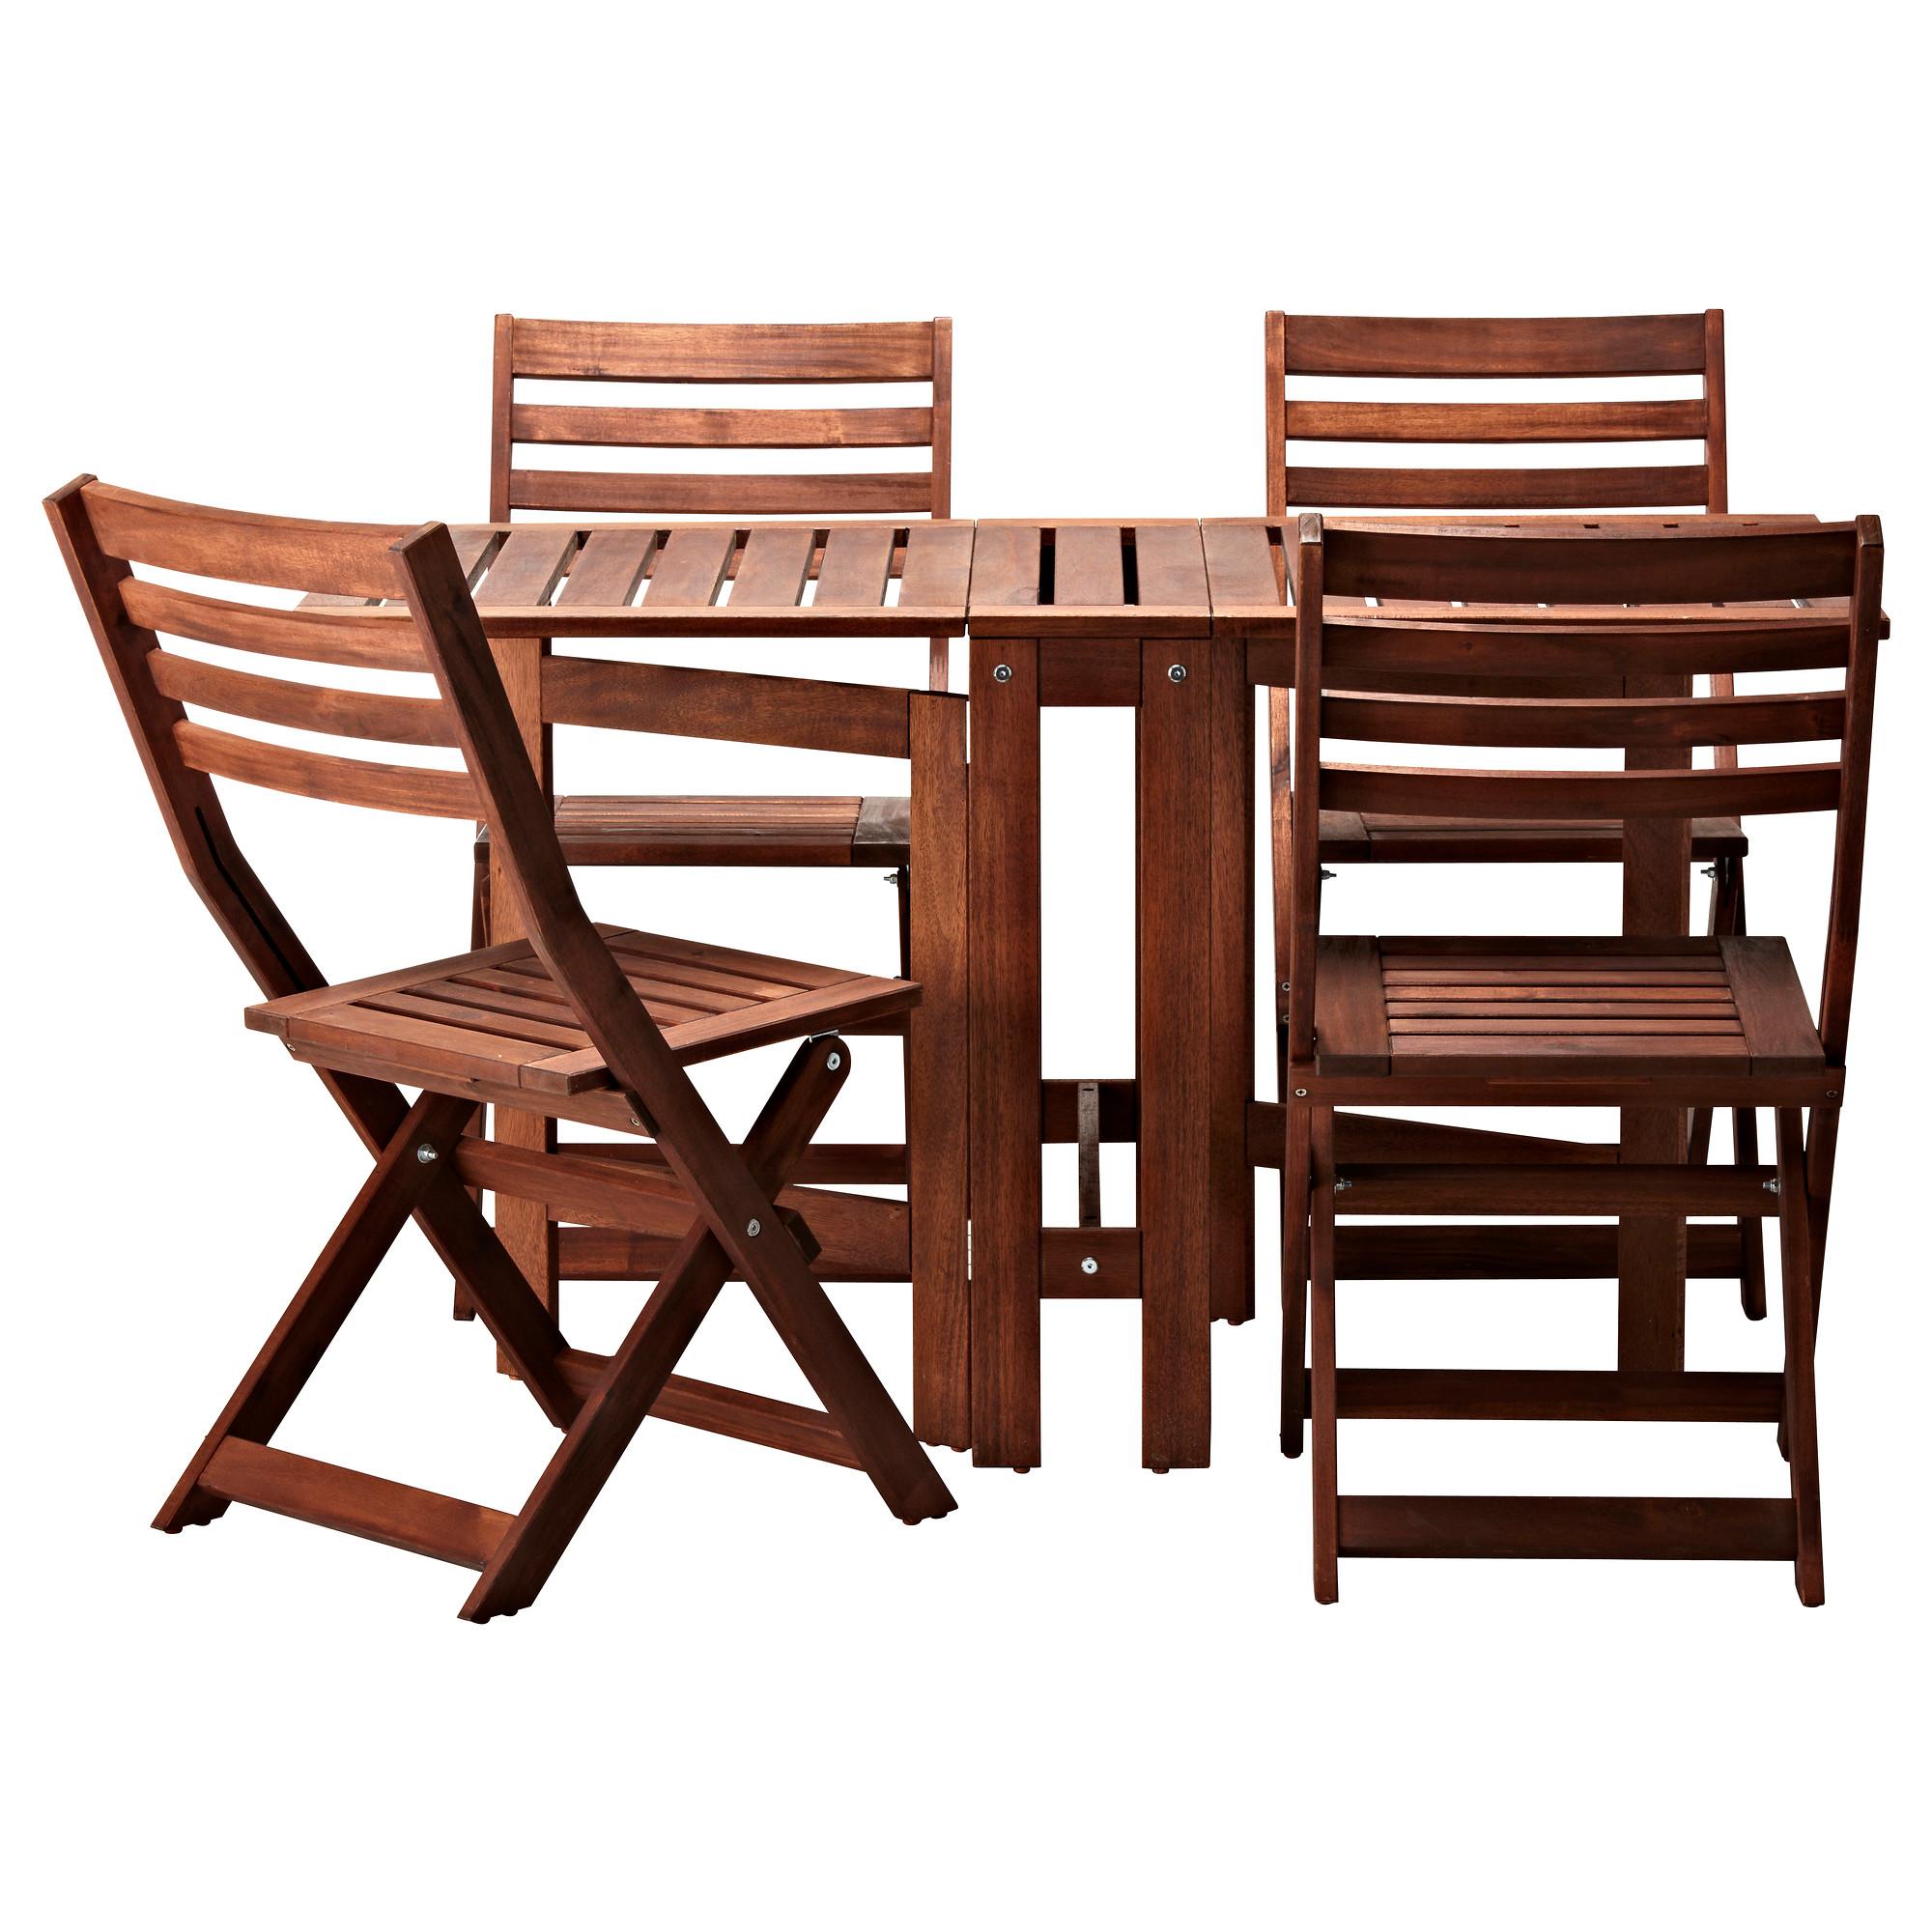 outdoor table and chairs ikea äpplarö table+4 folding chairs, outdoor UQJDDVU